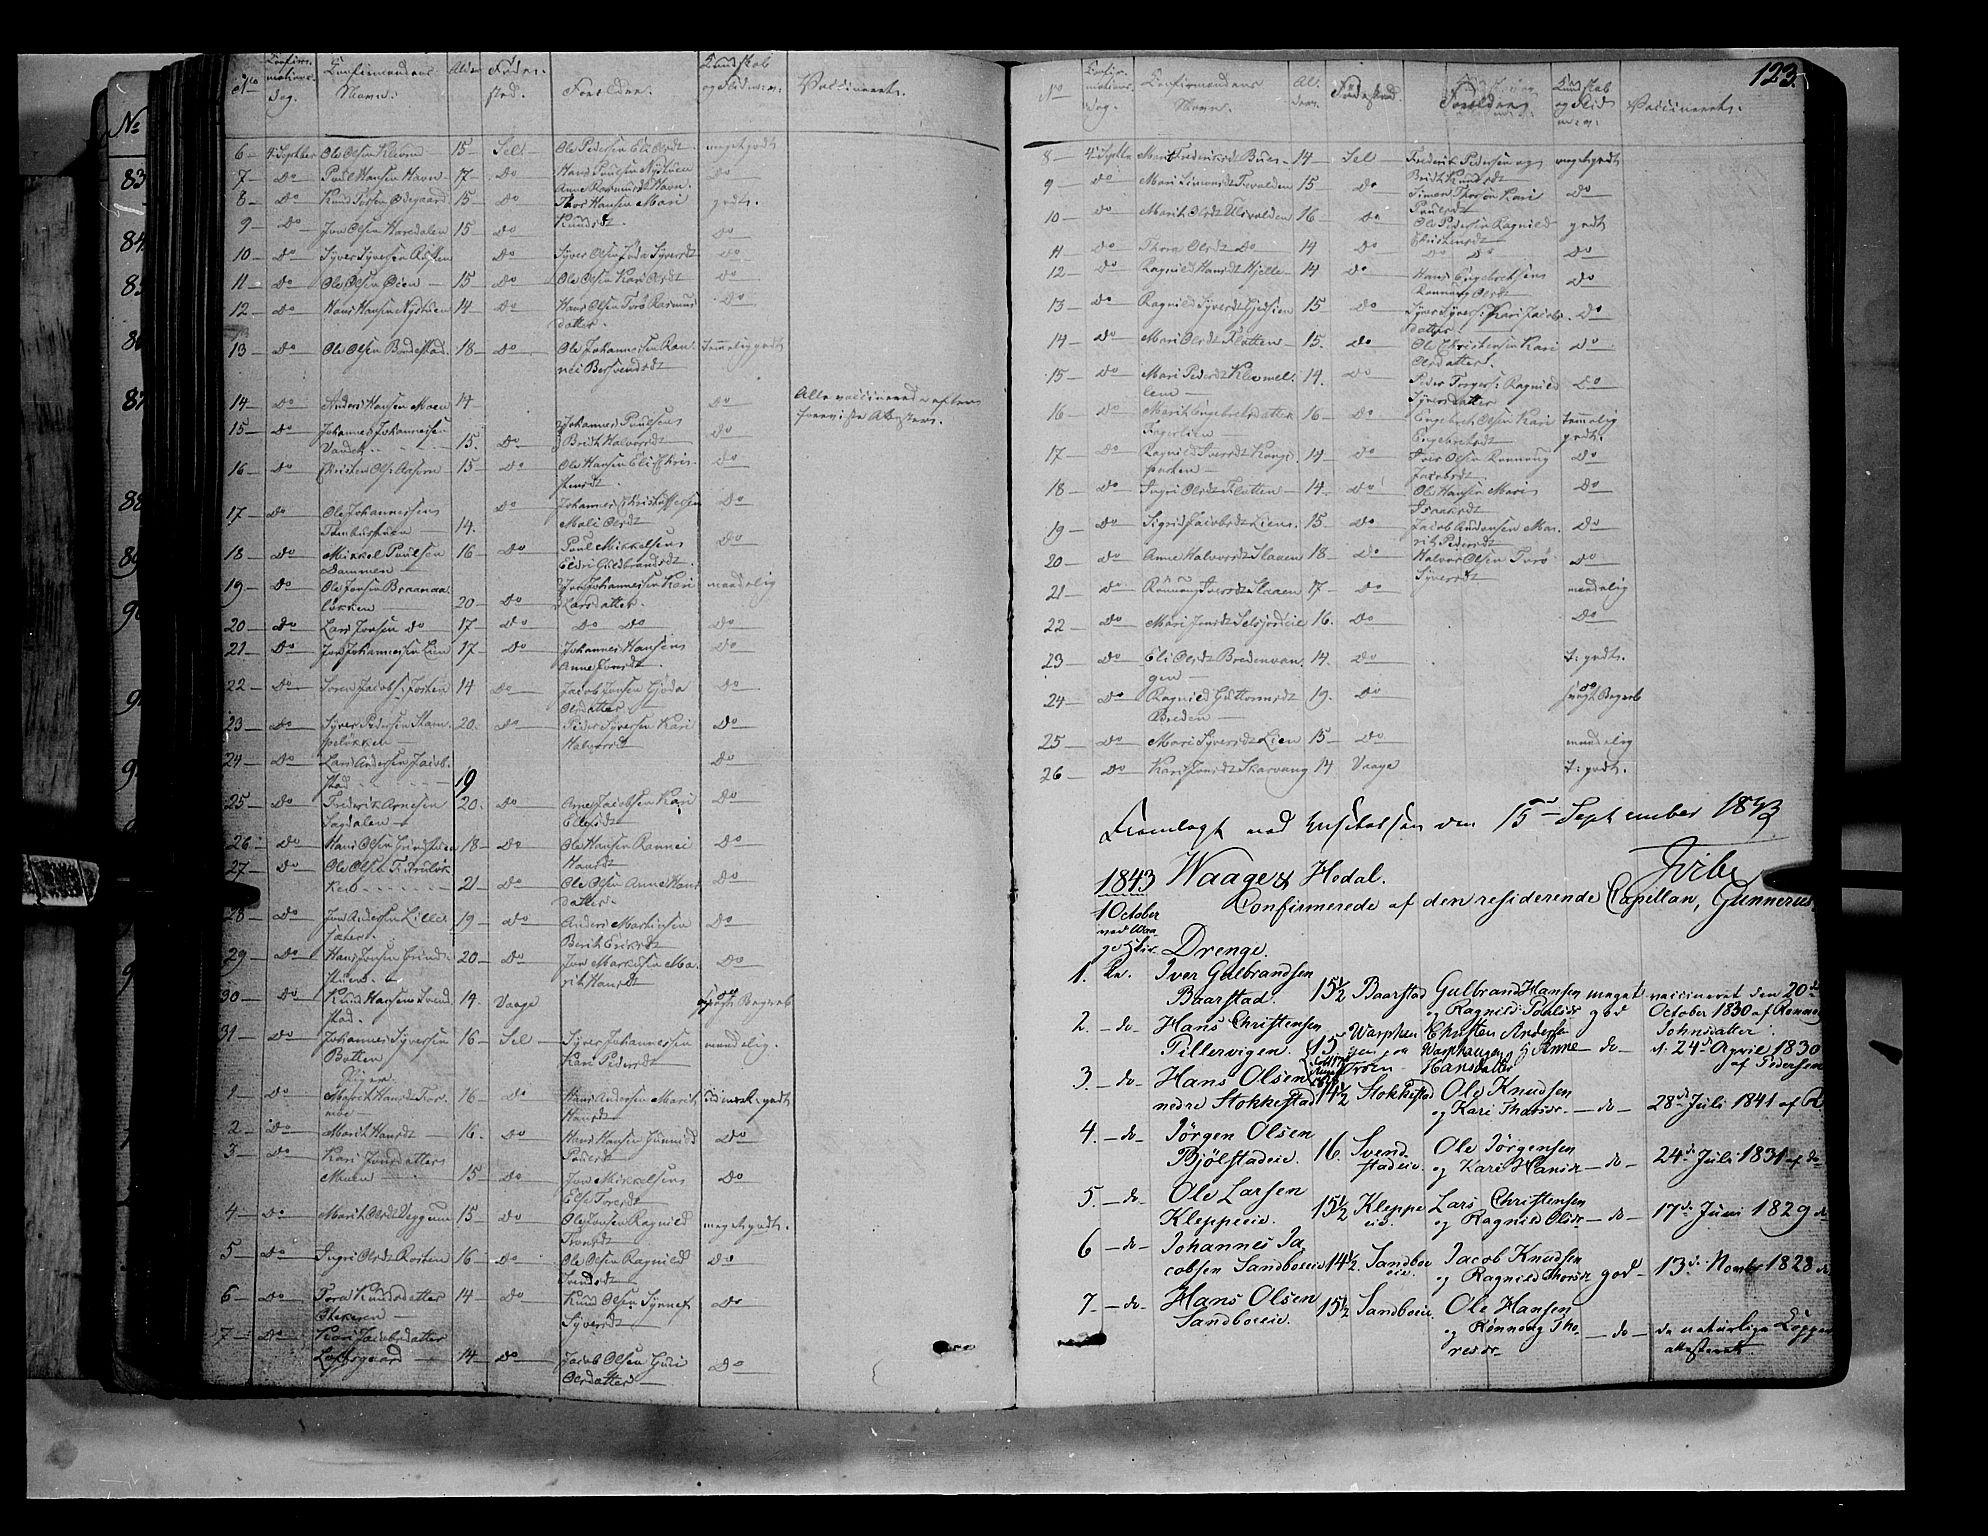 SAH, Vågå prestekontor, Ministerialbok nr. 5 /1, 1842-1856, s. 123